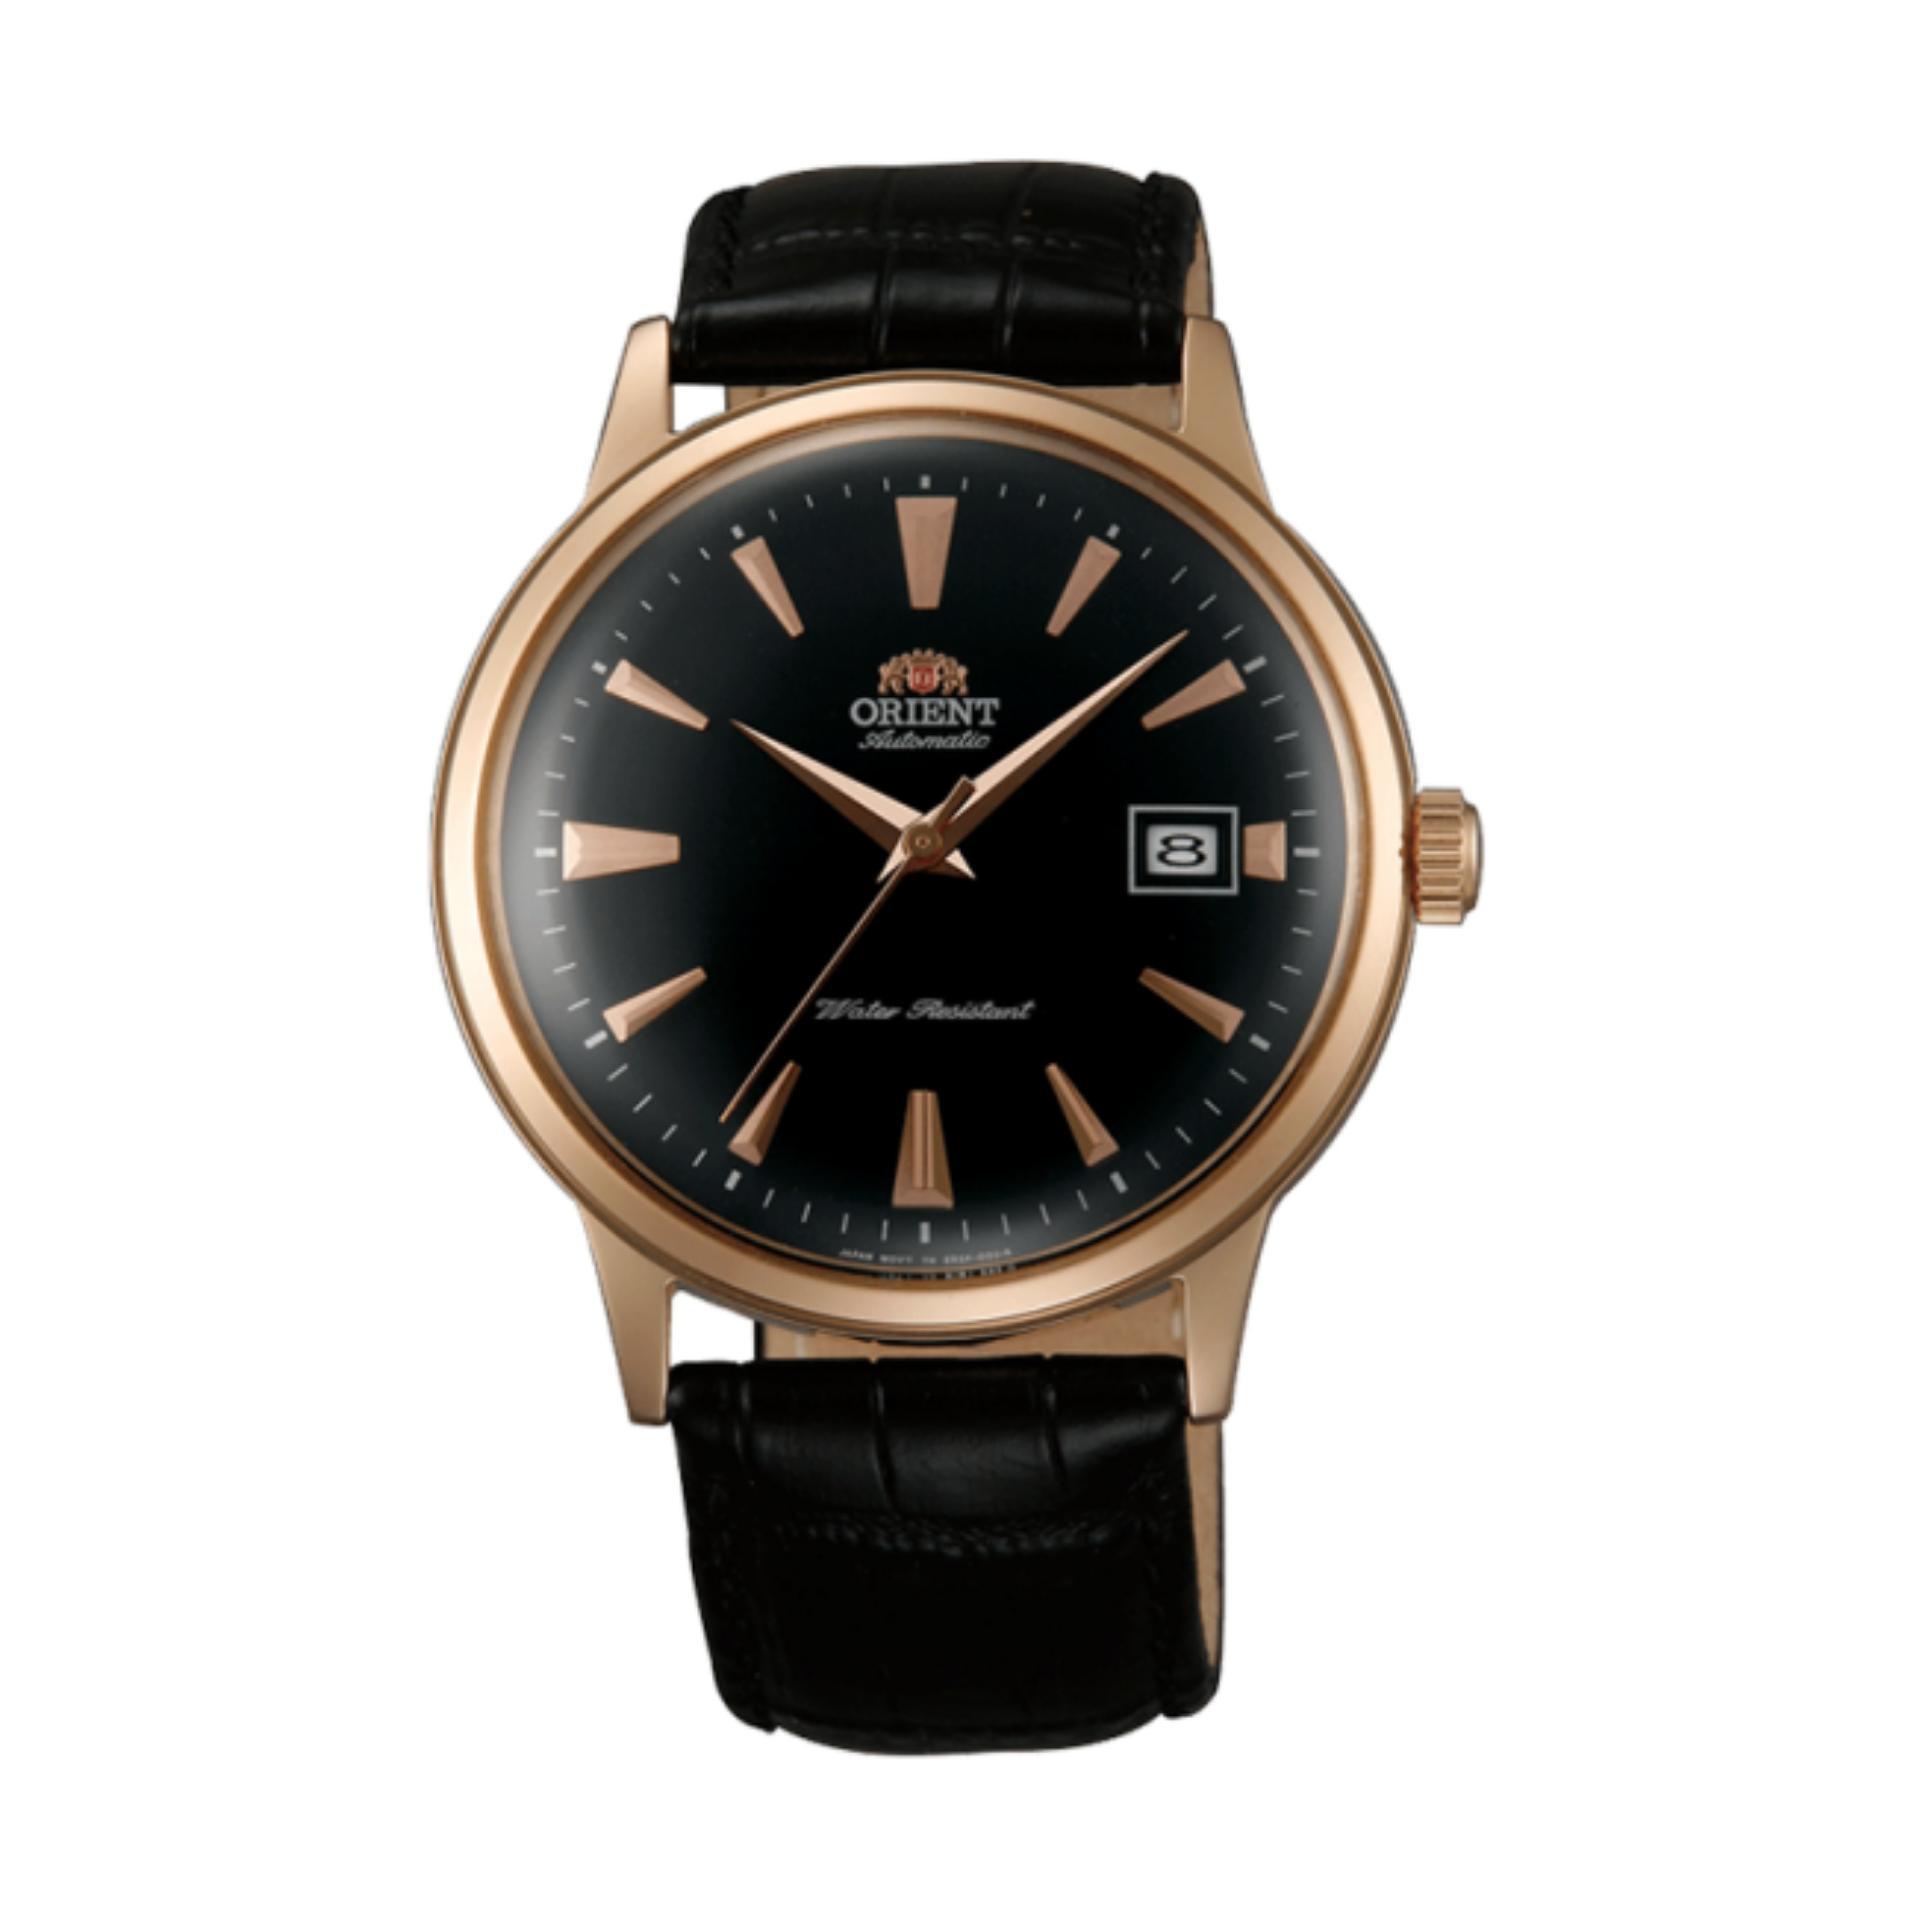 Orient Bambino Dome Crystal Japan Automatic Gold Tone Gent's Elegant Watch SAC00001B0 FAC00001B0